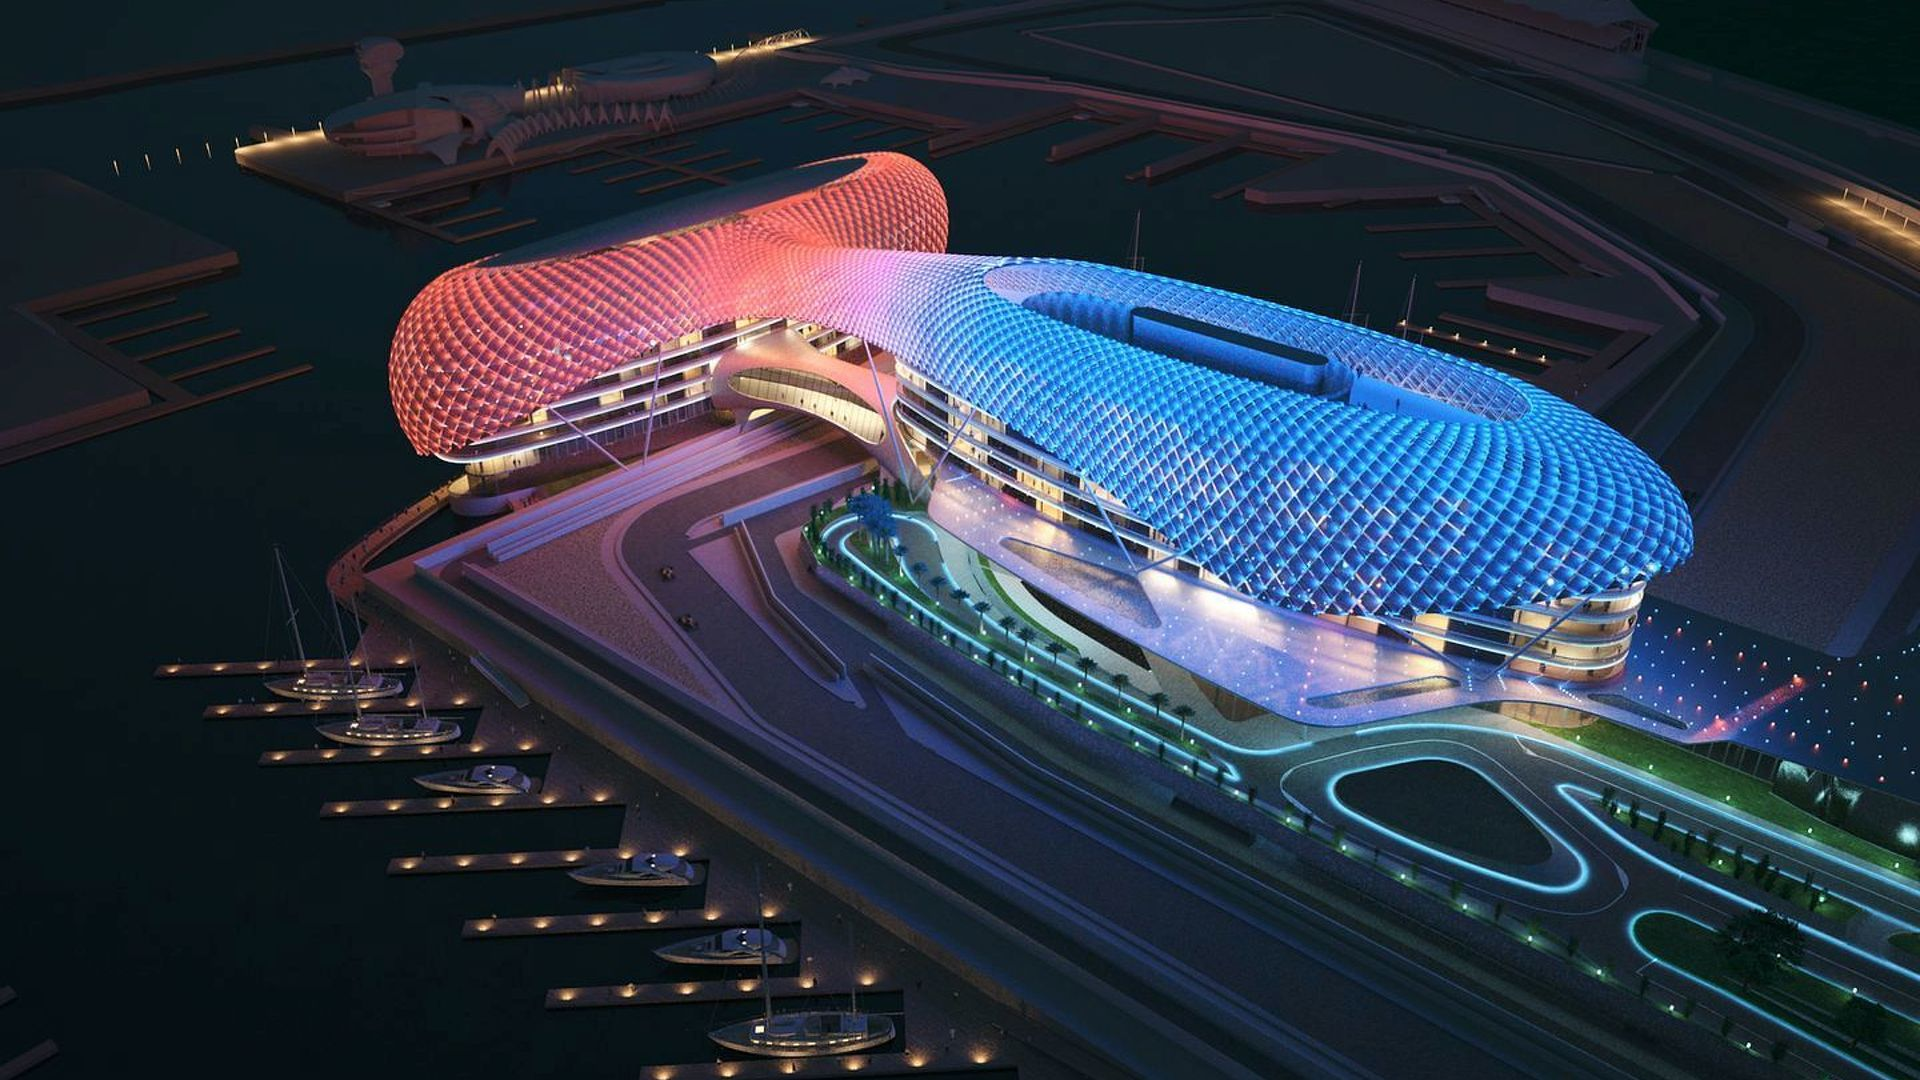 Abu Dhabi eyeing 50,000 crowd for first F1 race